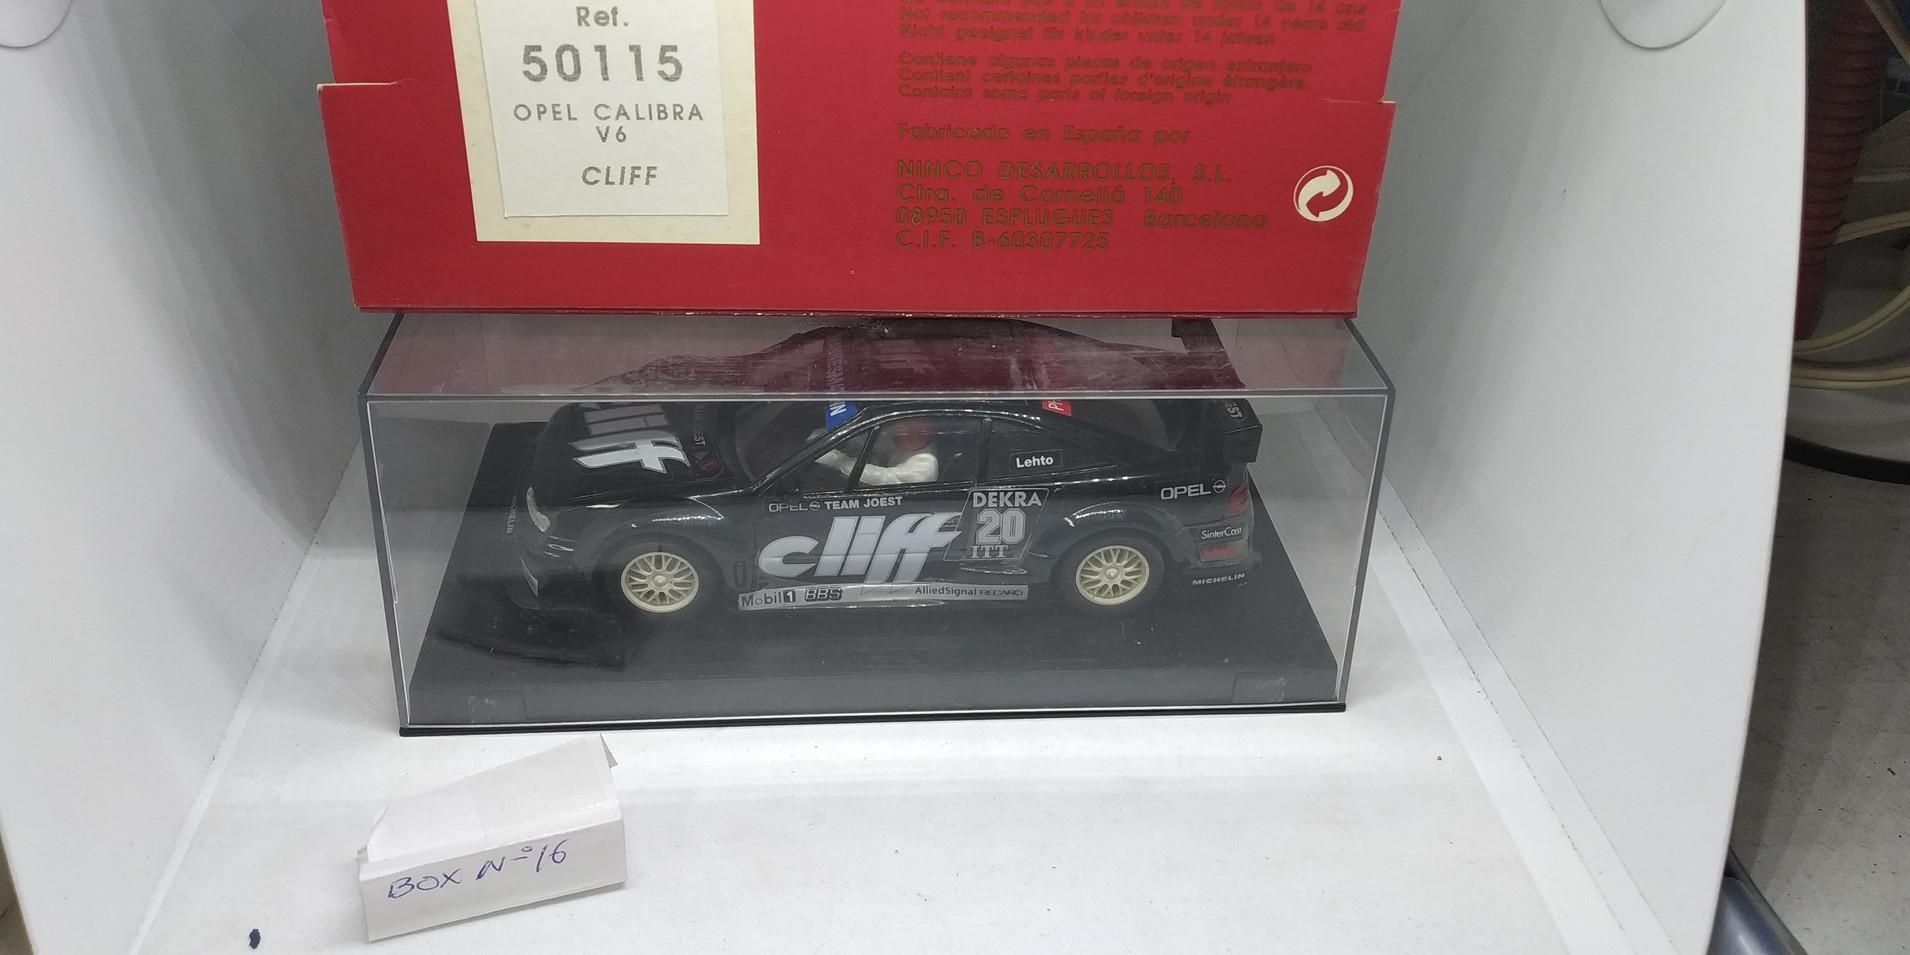 "OPEL CALIBRA V6 ""CLIFF"" REF.50115 NINCO"